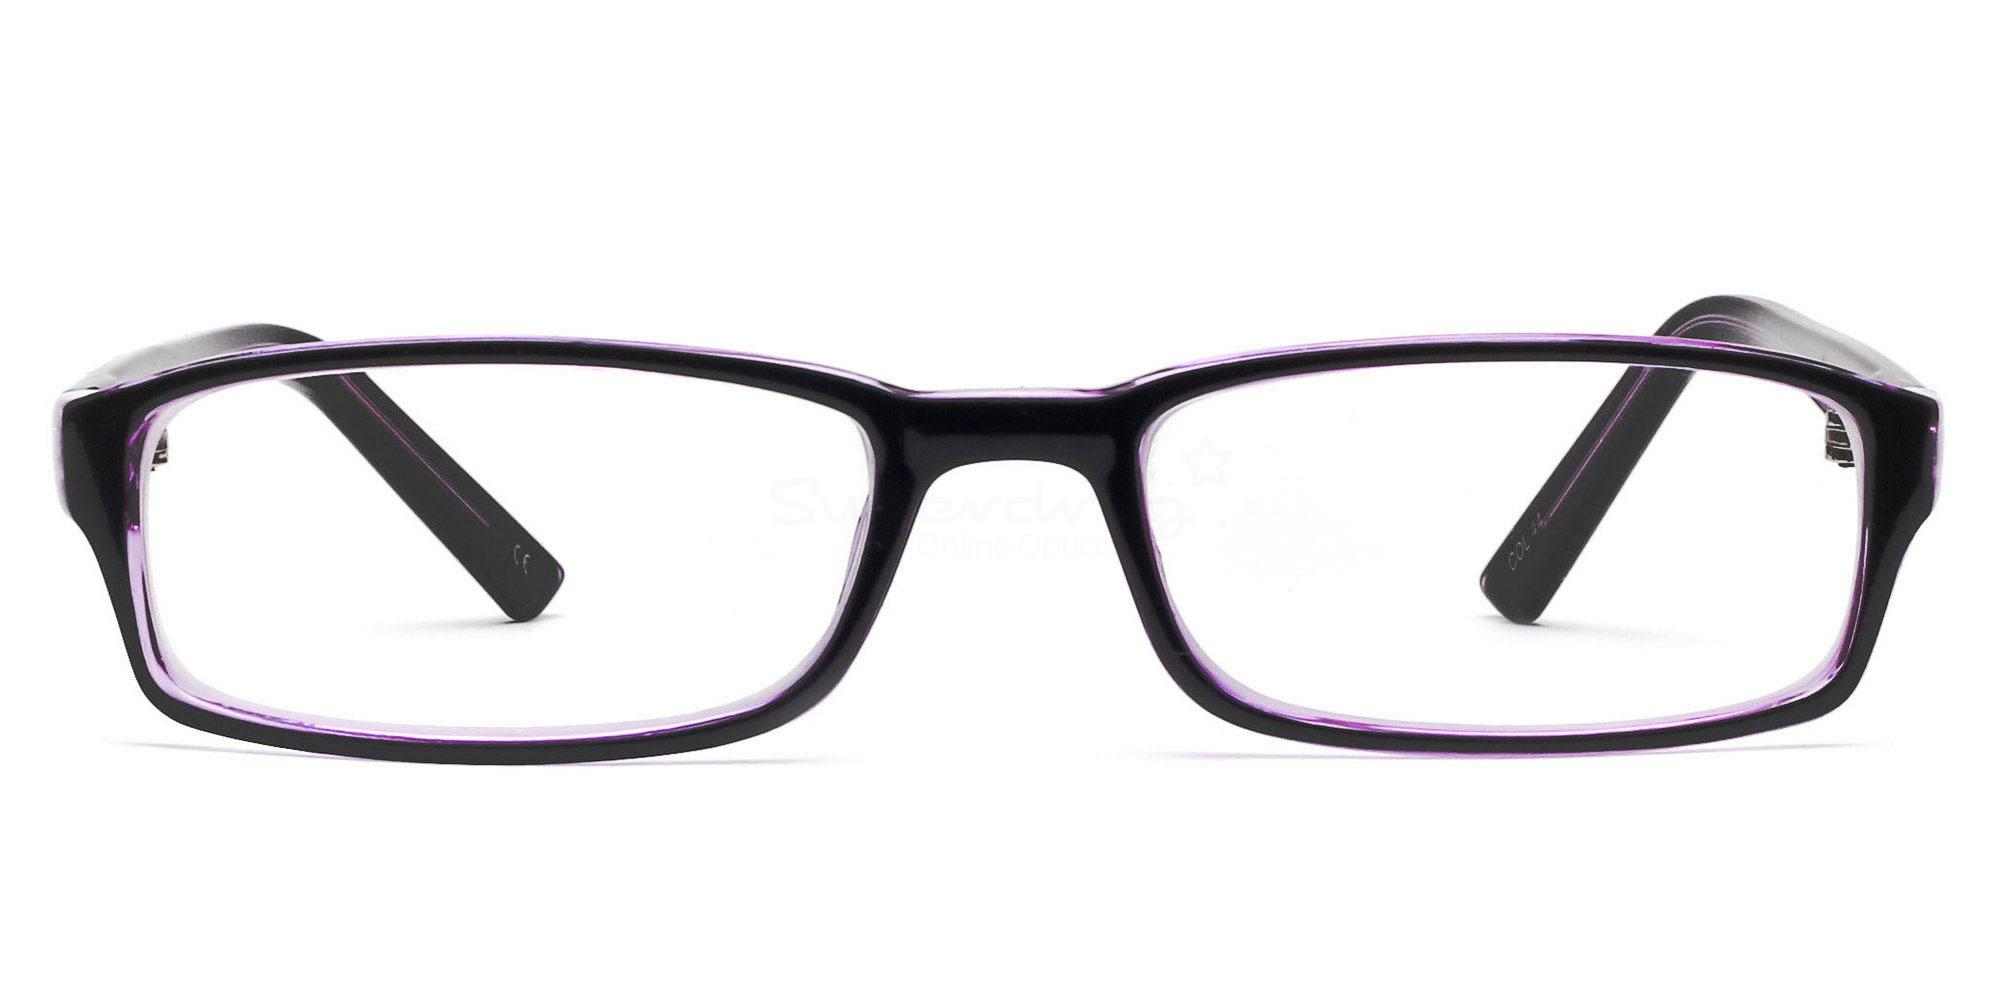 COL.44 2264 - Purple and Black Glasses, Helium